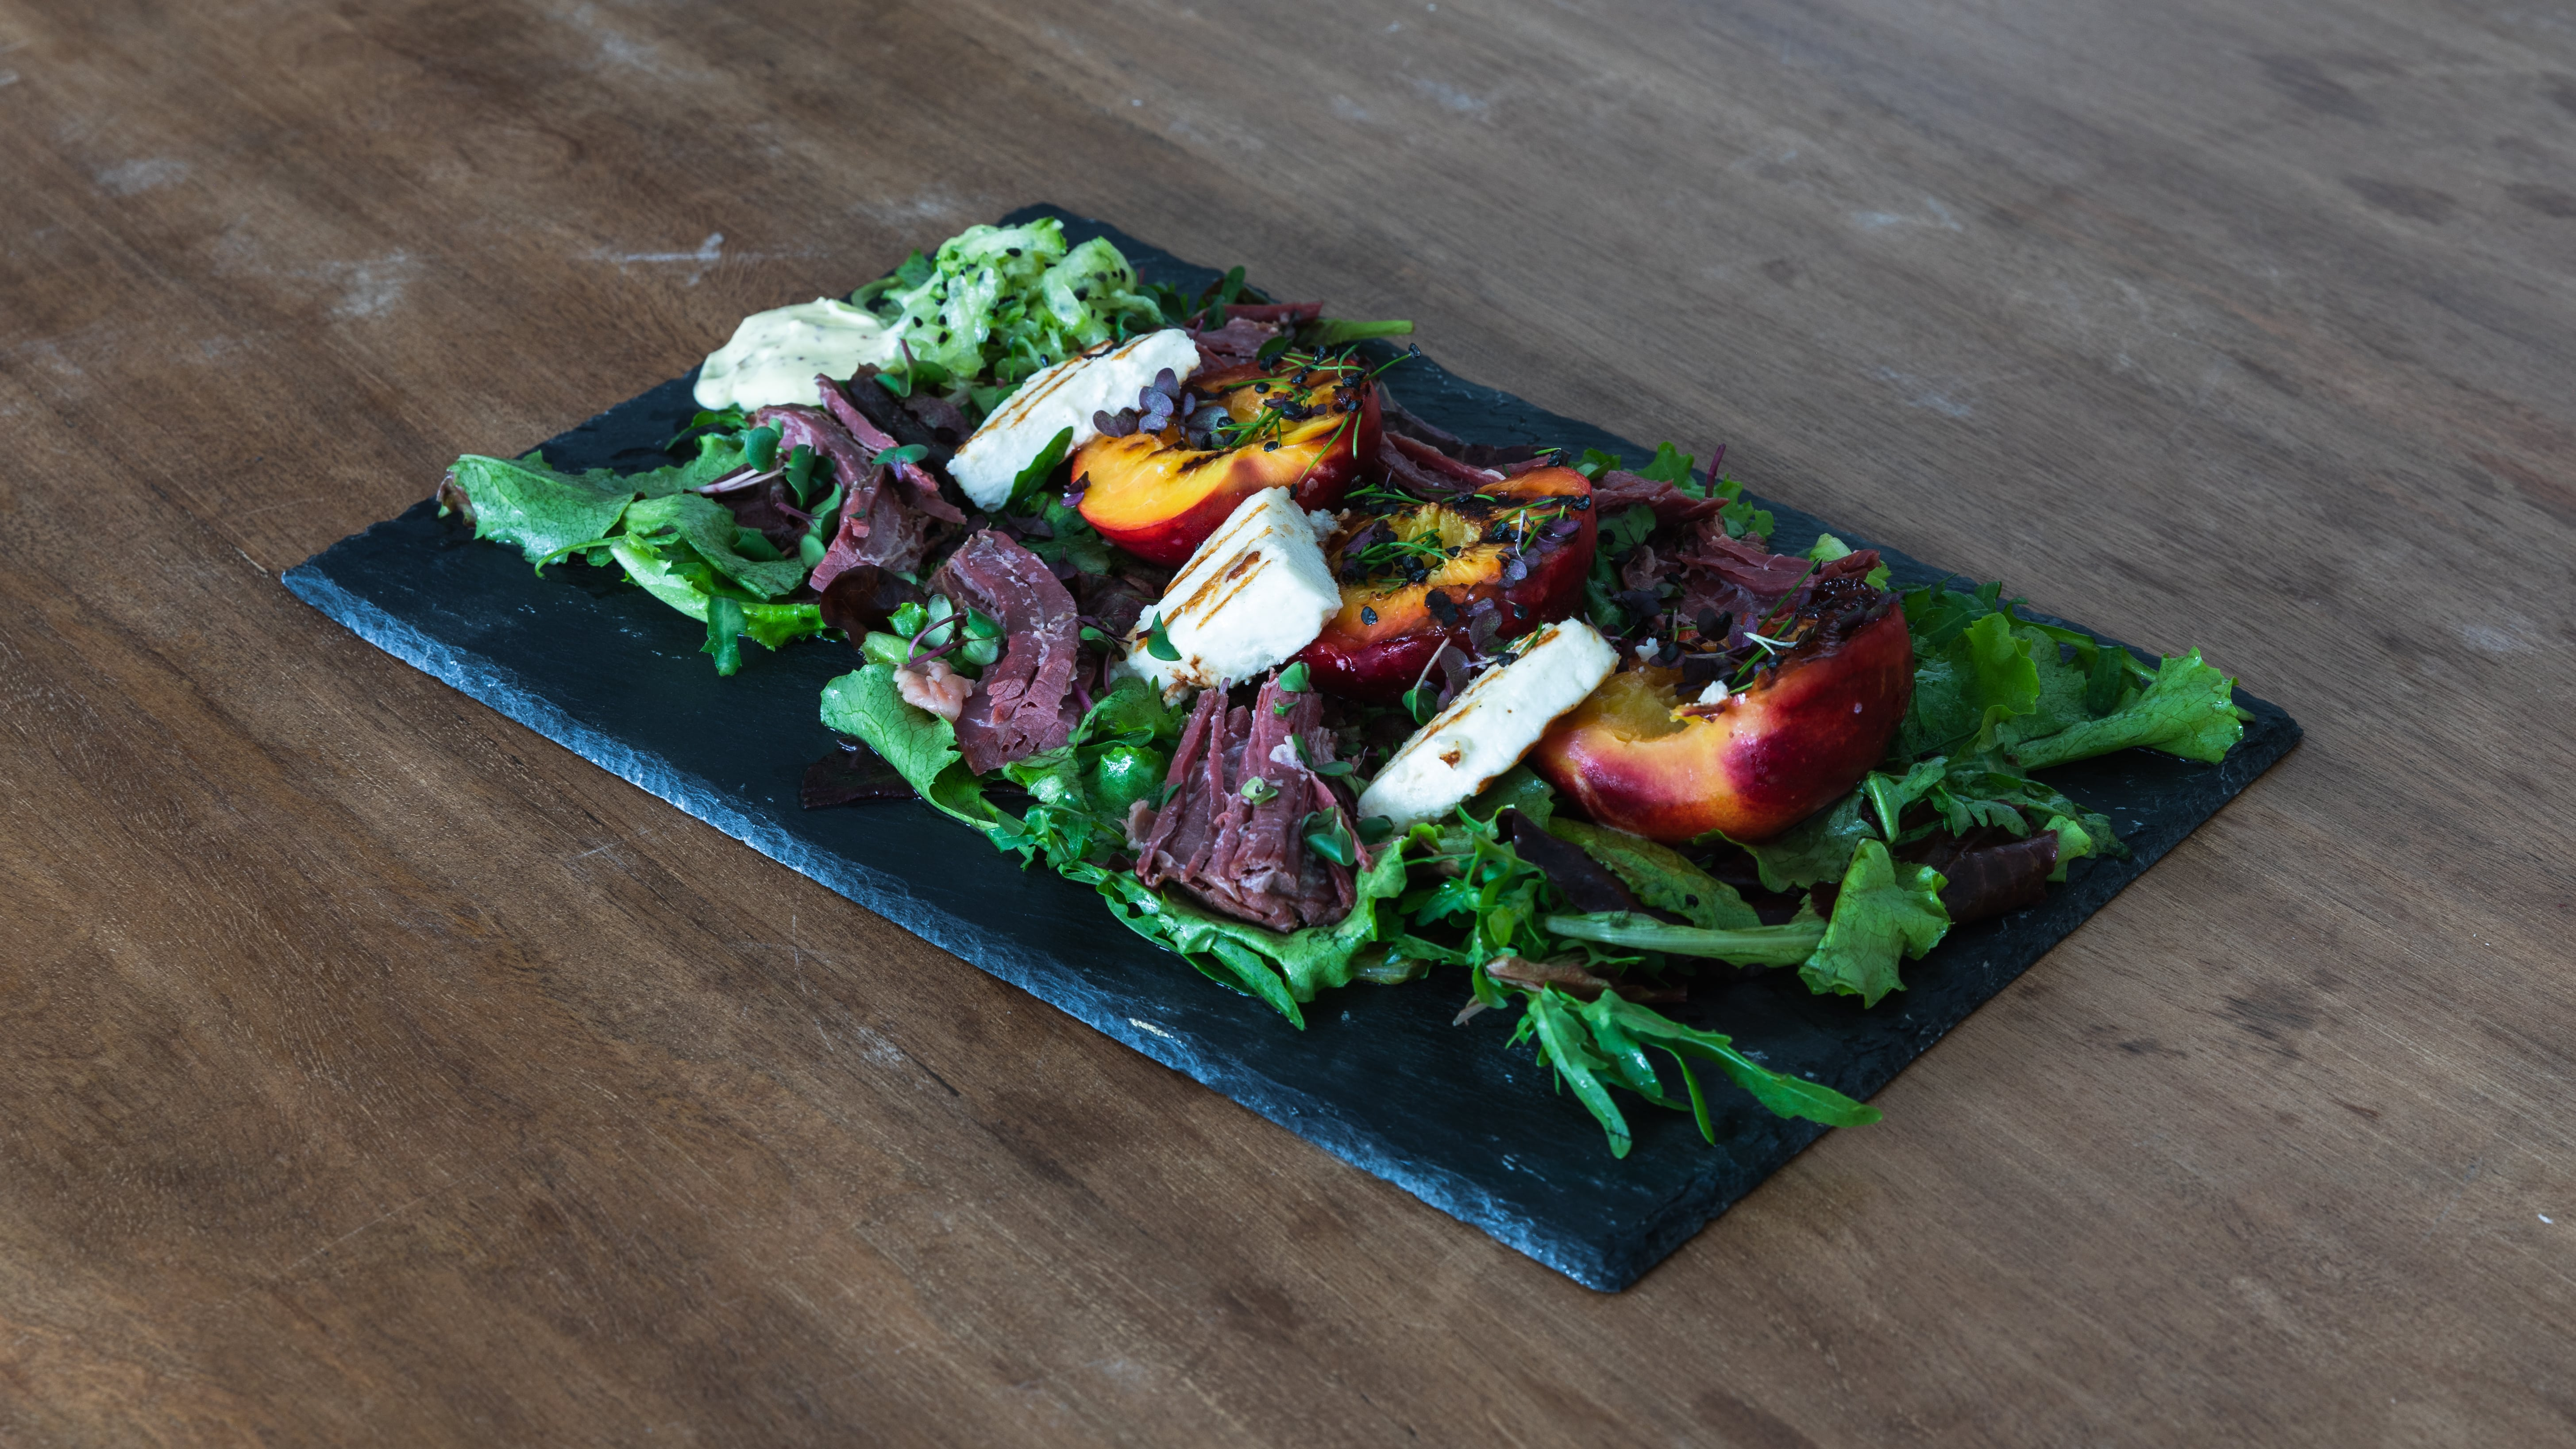 Ethical Restaurant | Kensington | Conscience Kitchen